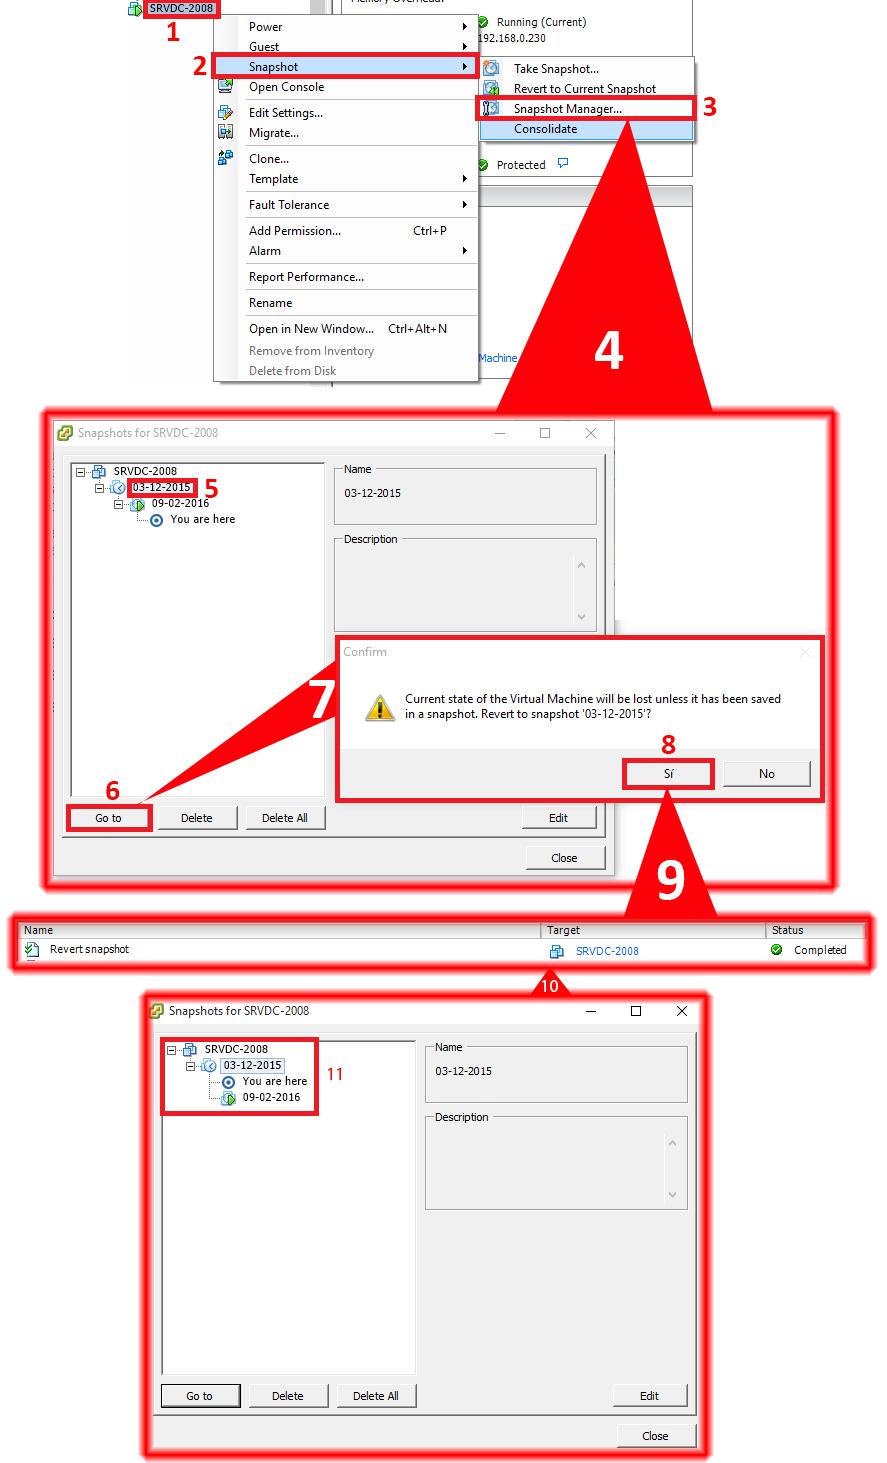 how to delete vmware snapshot manually